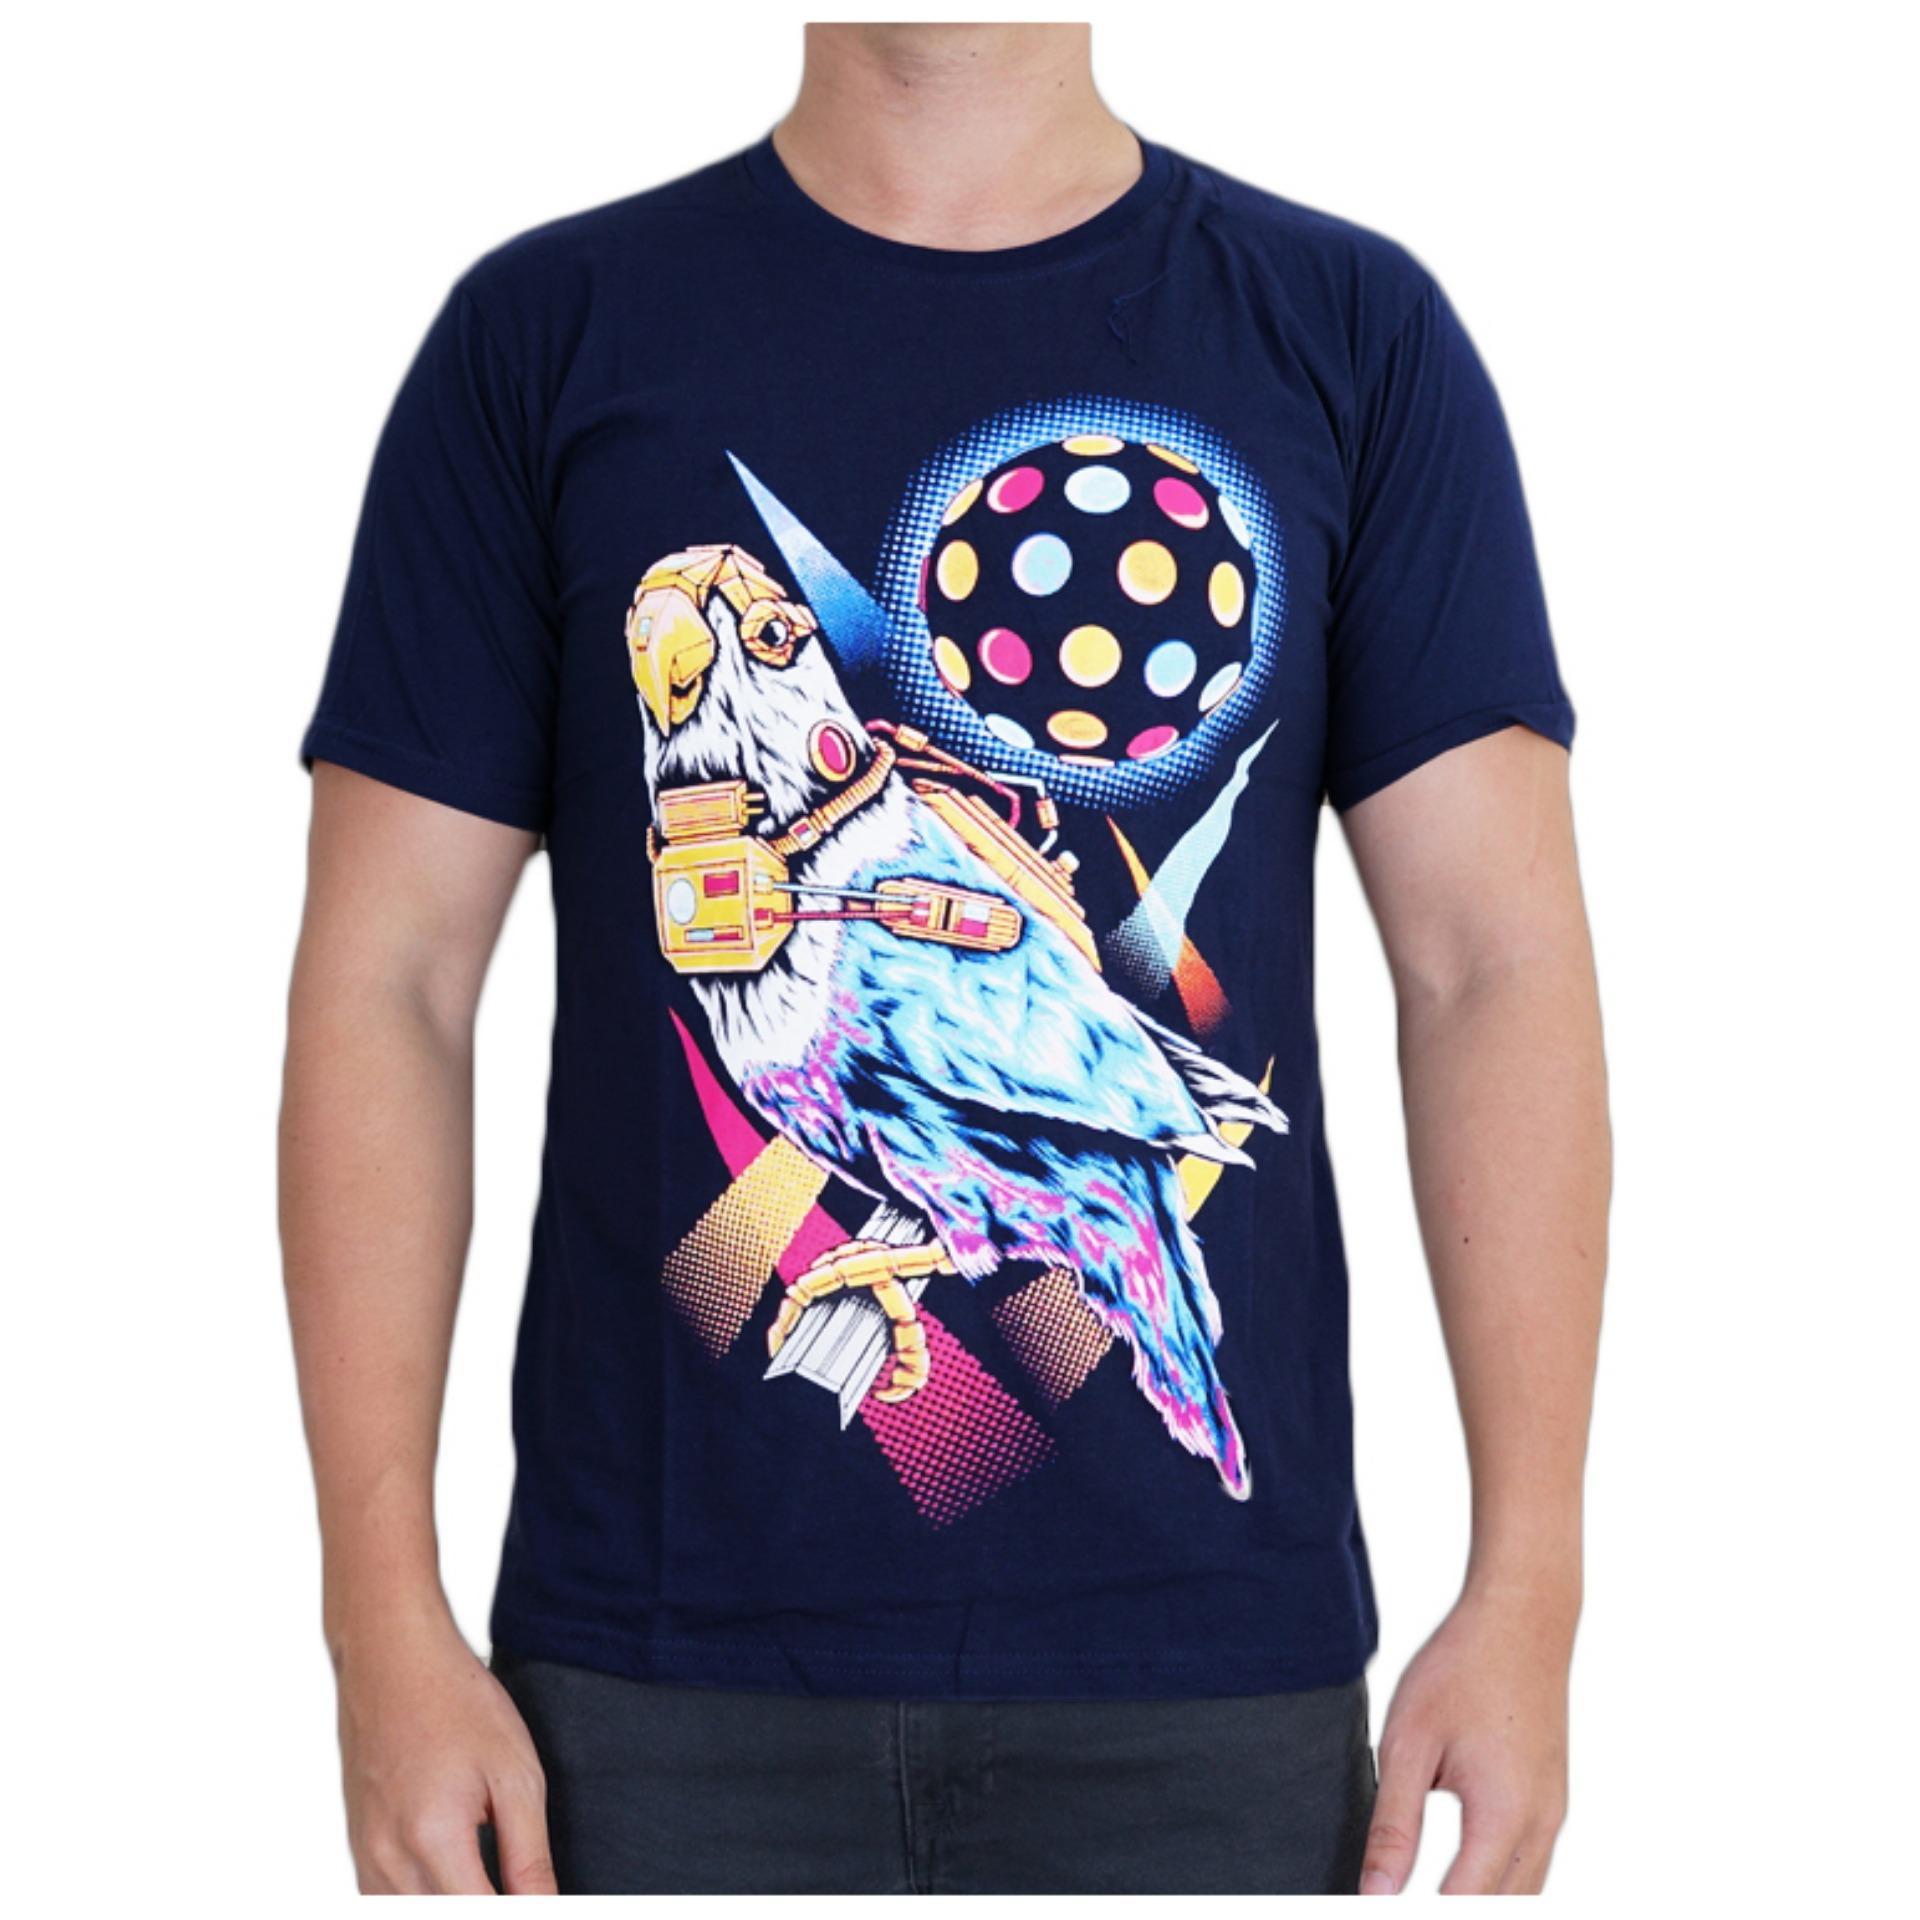 Vanwin - Kaos T-Shirt Distro / kaos Pria / Tshirt Pria / Distro Pria